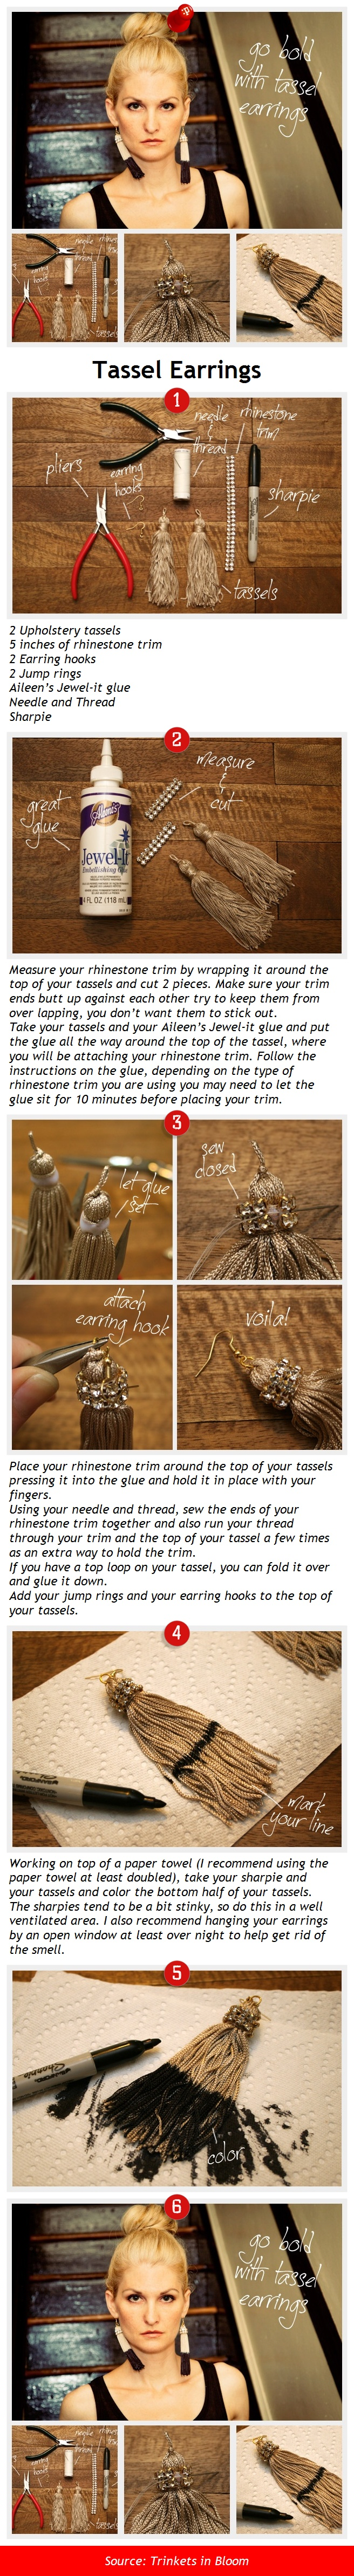 Tassel Earrings via pindemy.com